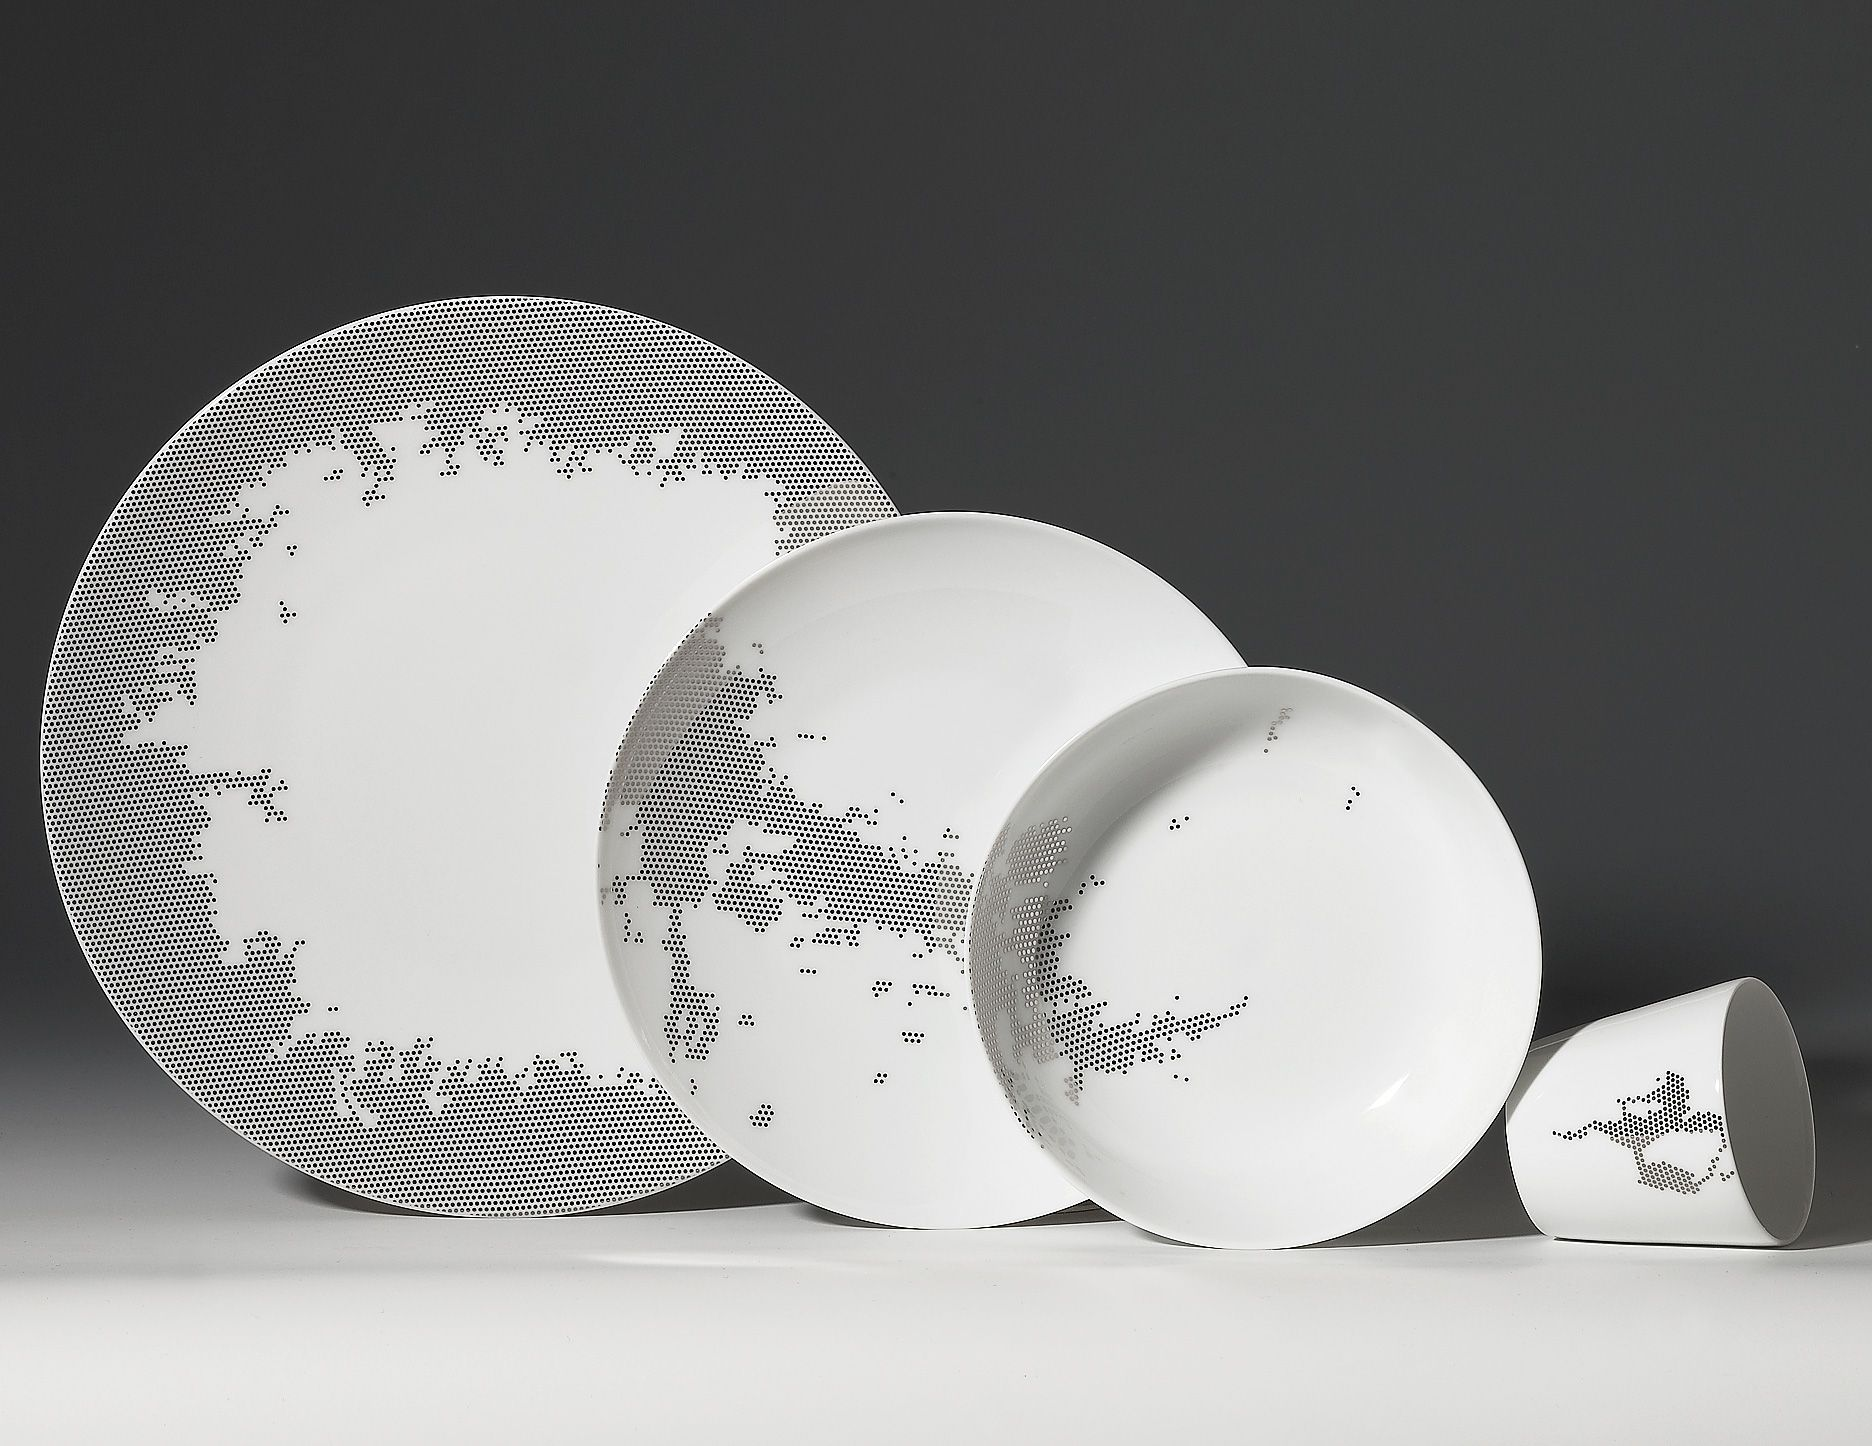 Luxury Porcelain Tableware with Modern Design by Non Sans Raison | DigsDigs & Luxury Porcelain Tableware with Modern Design by Non Sans Raison ...